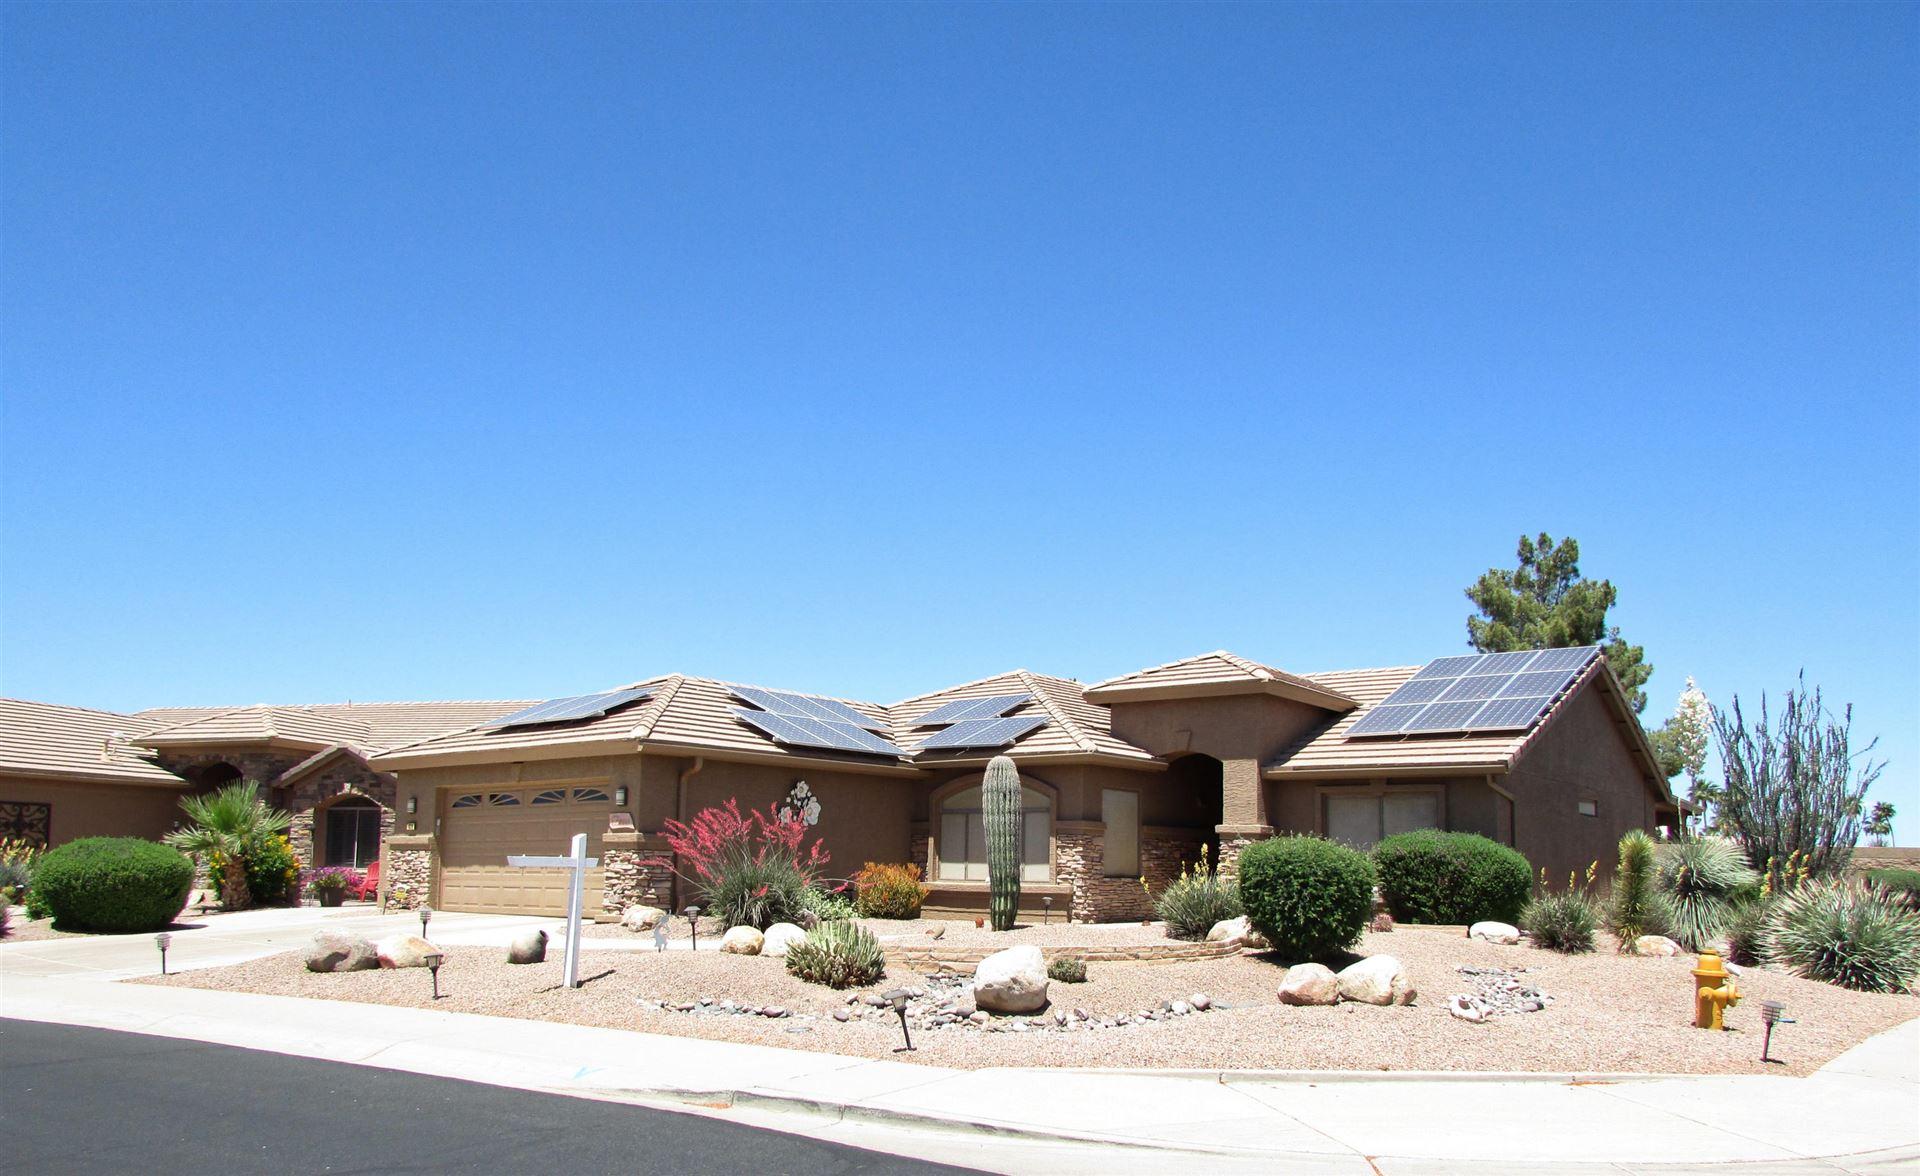 Photo of 420 W CEDAR Drive, Sun Lakes, AZ 85248 (MLS # 6229836)